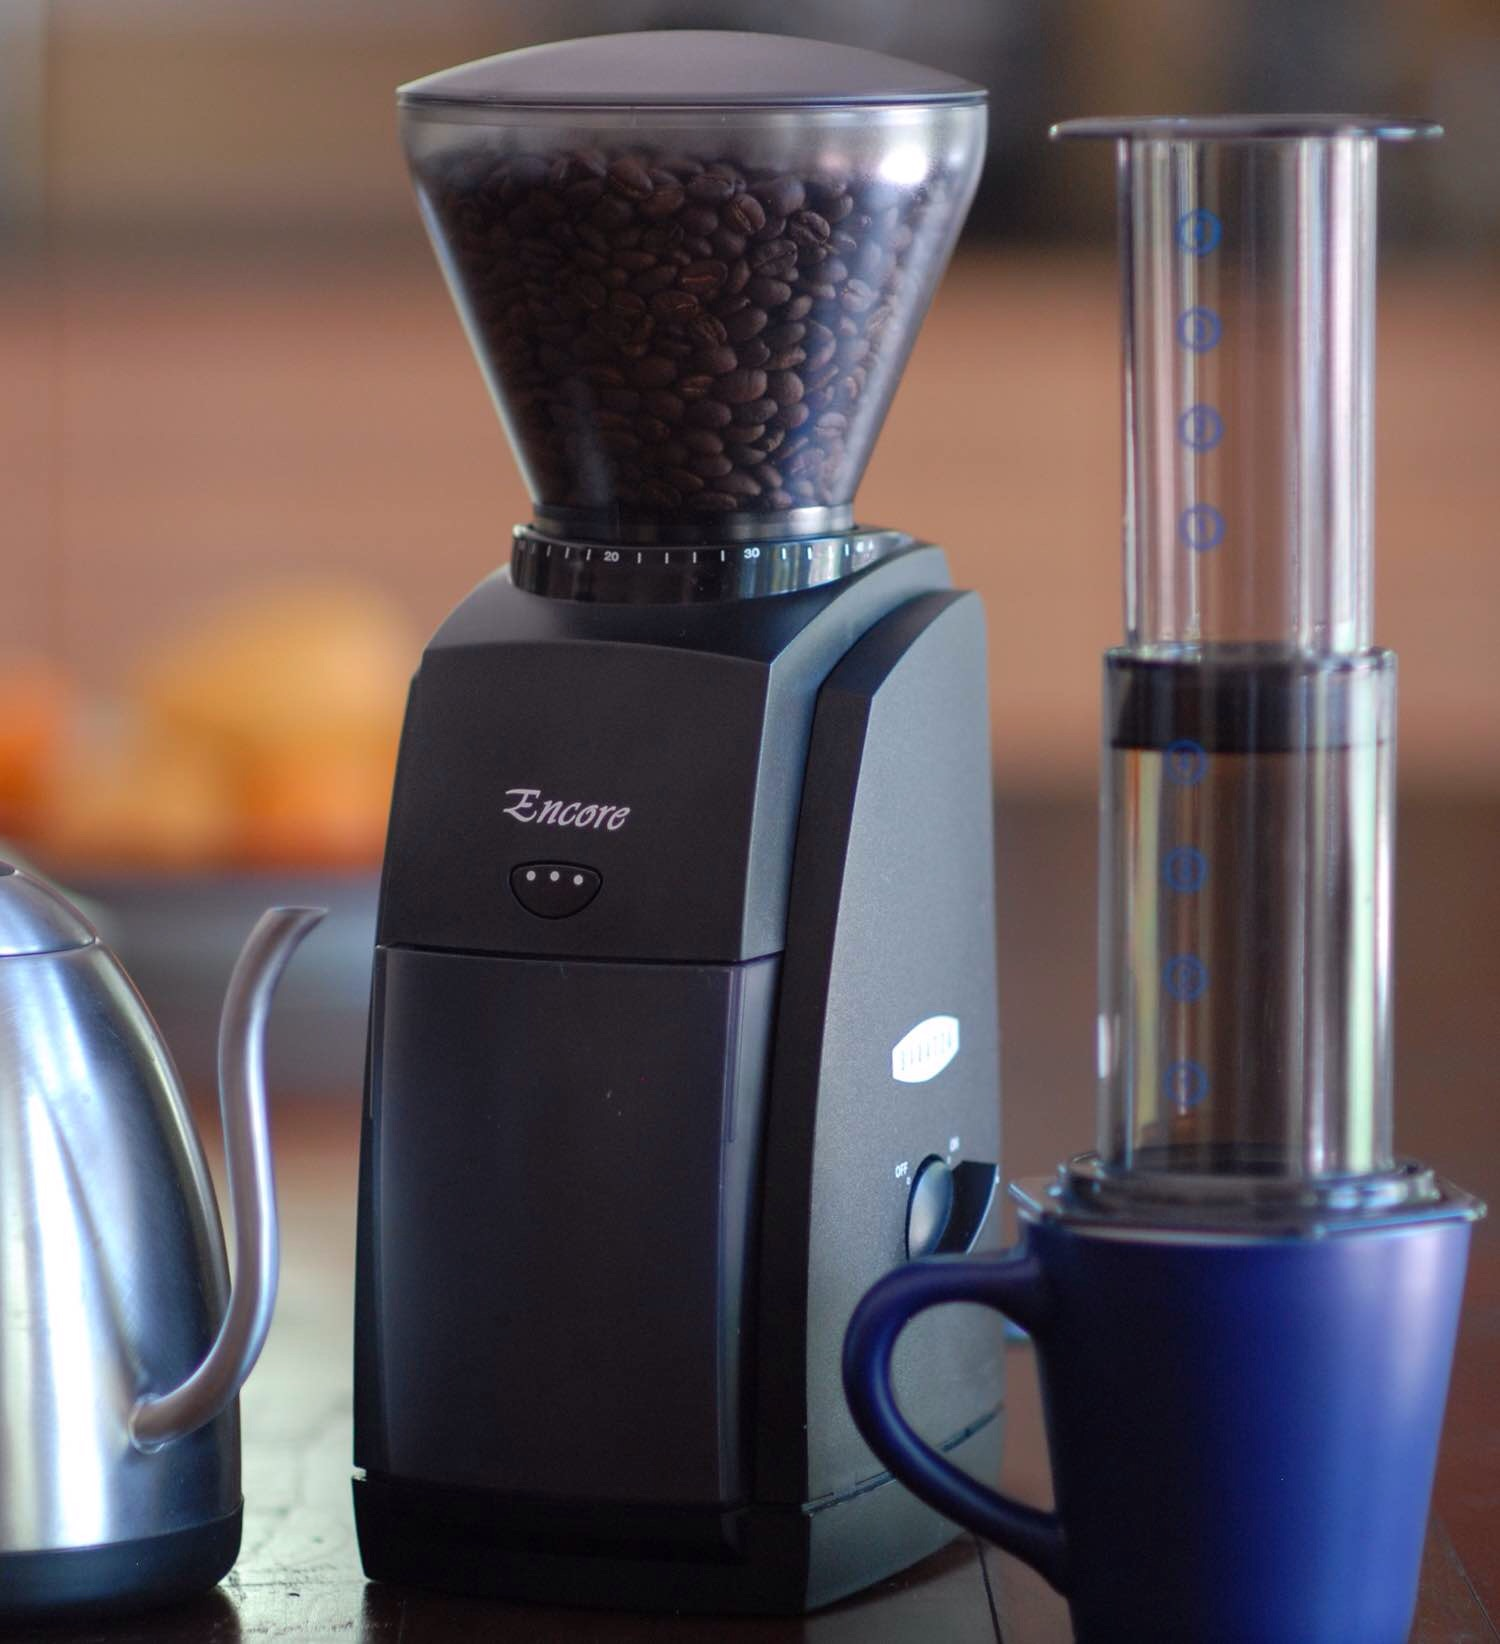 Baratza's Encore coffee grinder. ($129)